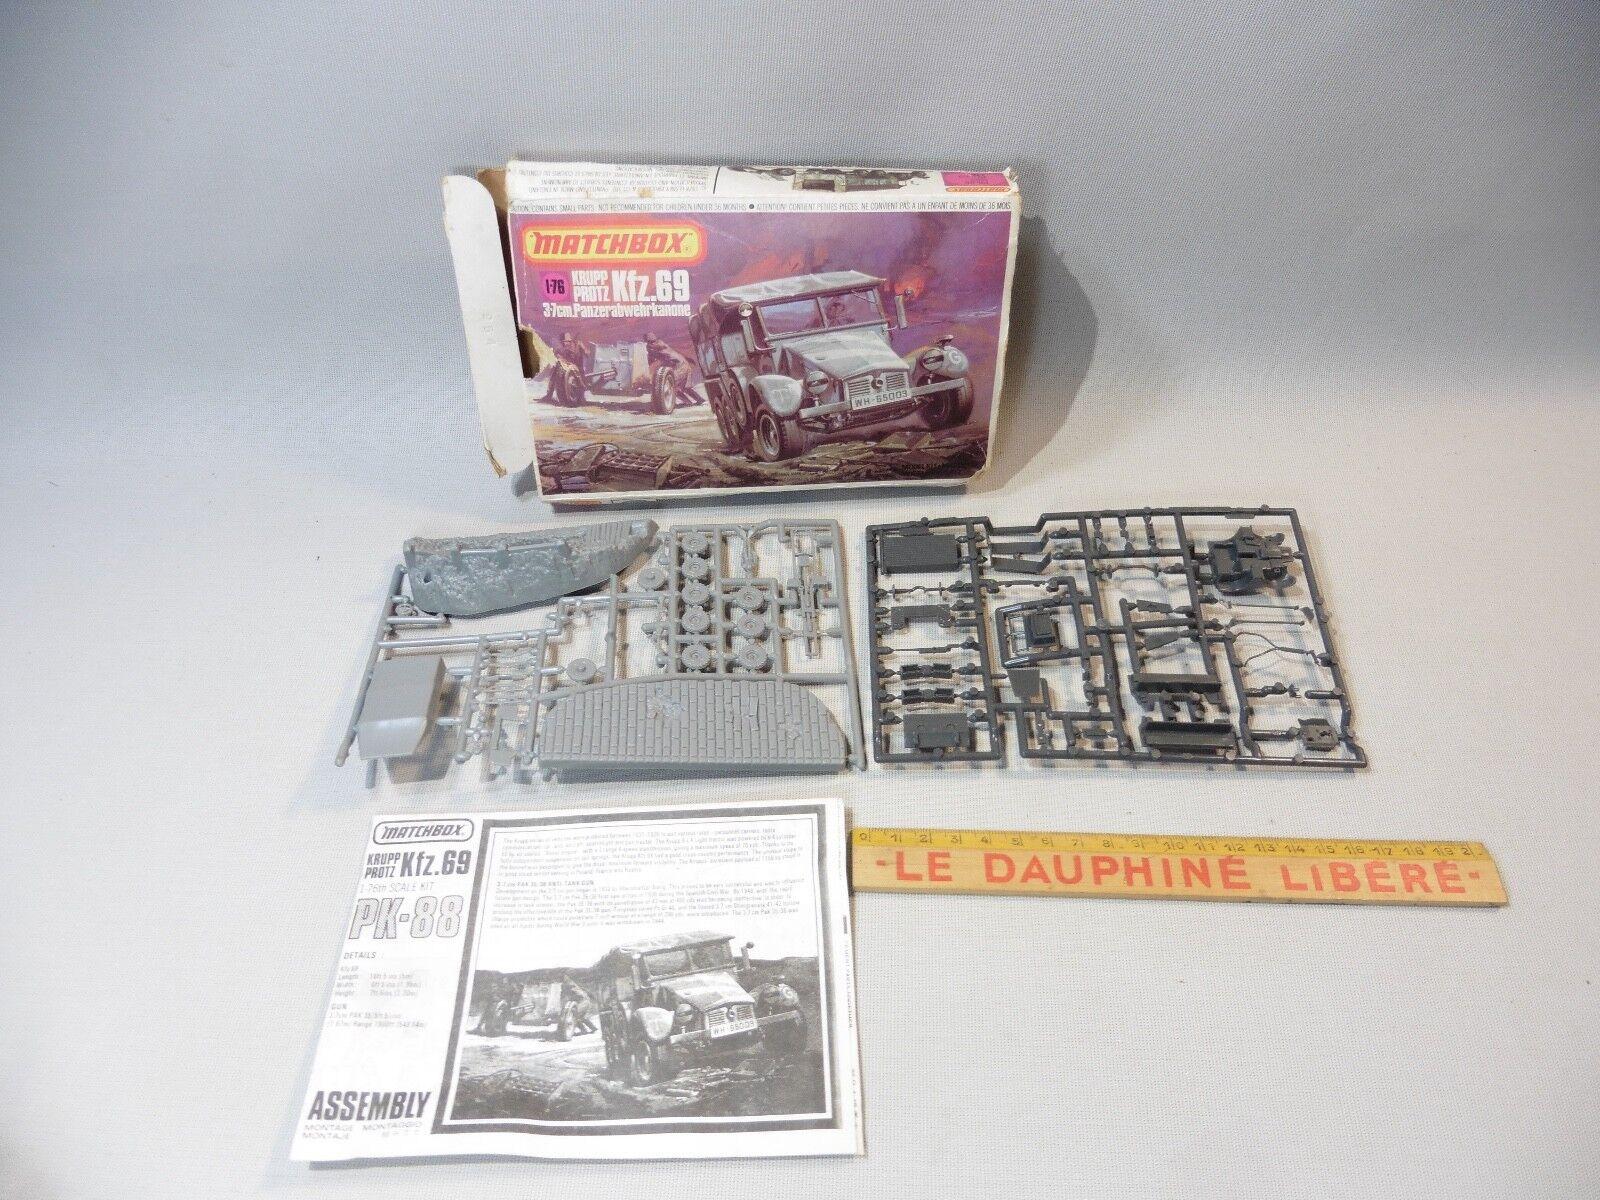 Matchbox - protz kfz.69 modellino